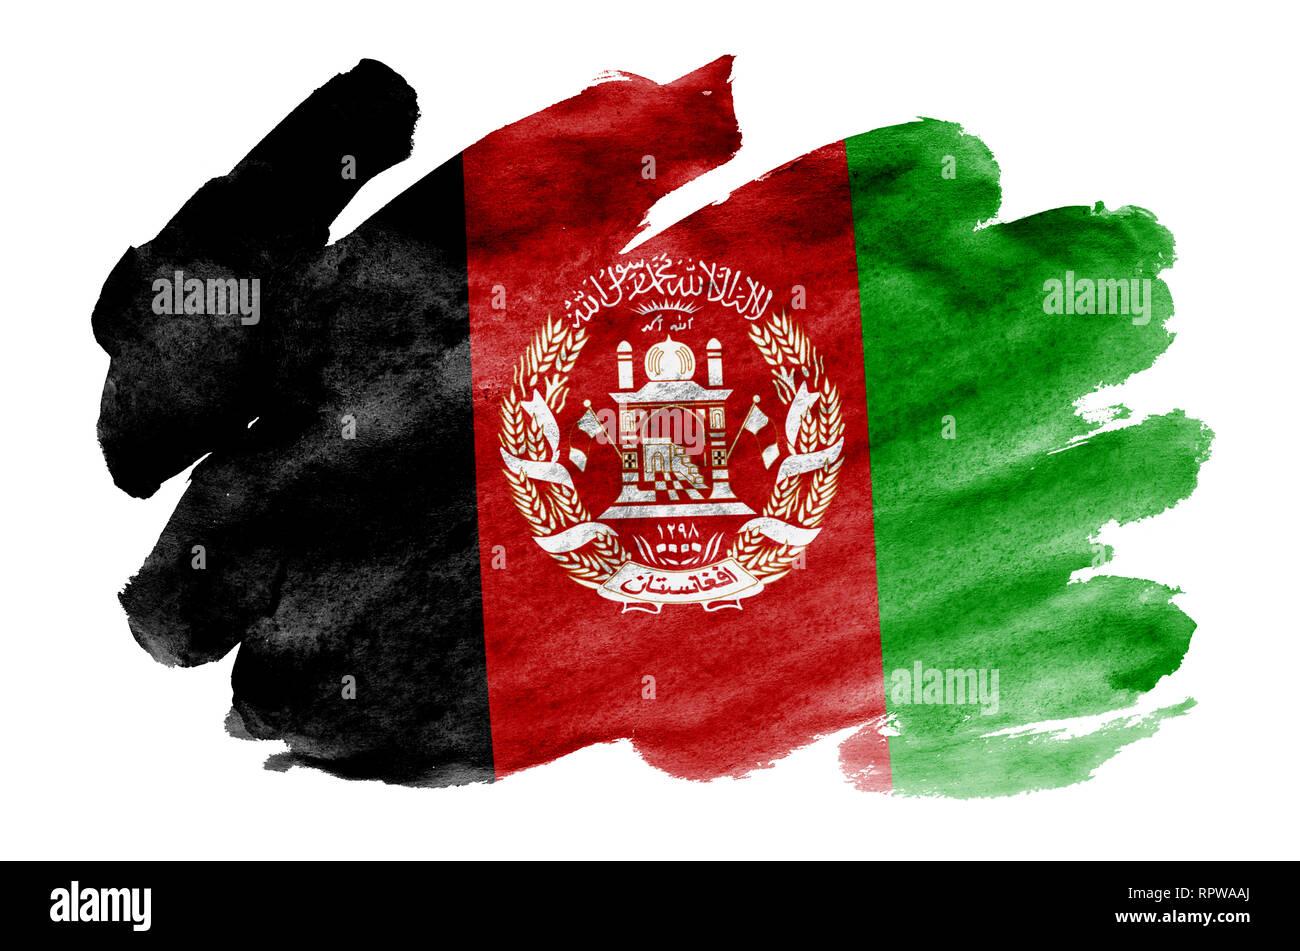 Afghanistan Fahne Ist In Flussiger Aquarell Stil Auf Weissem